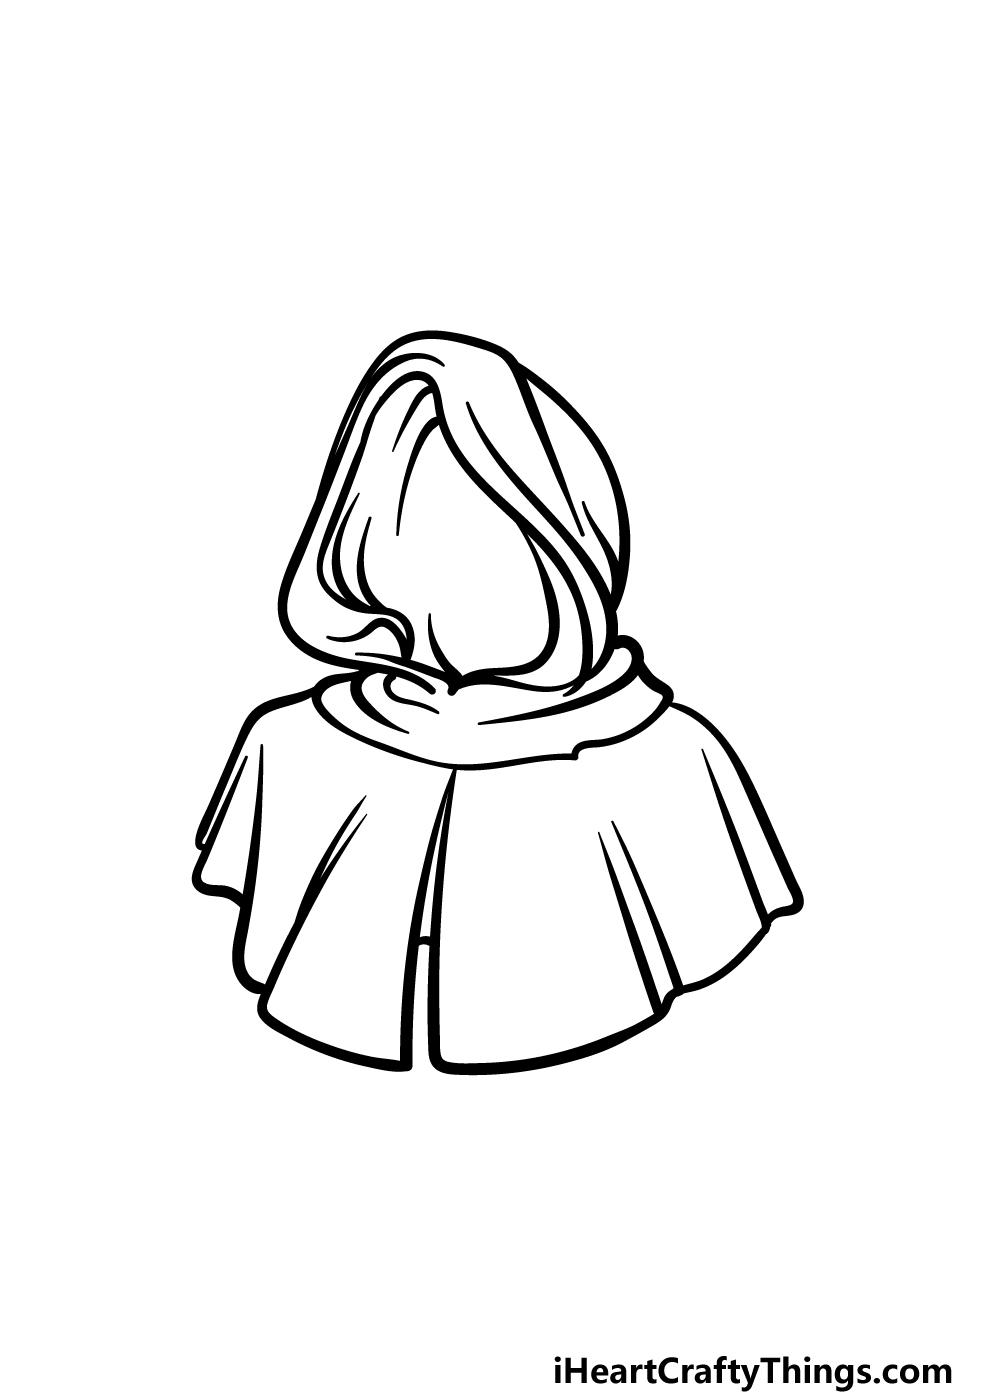 drawing a hood step 5